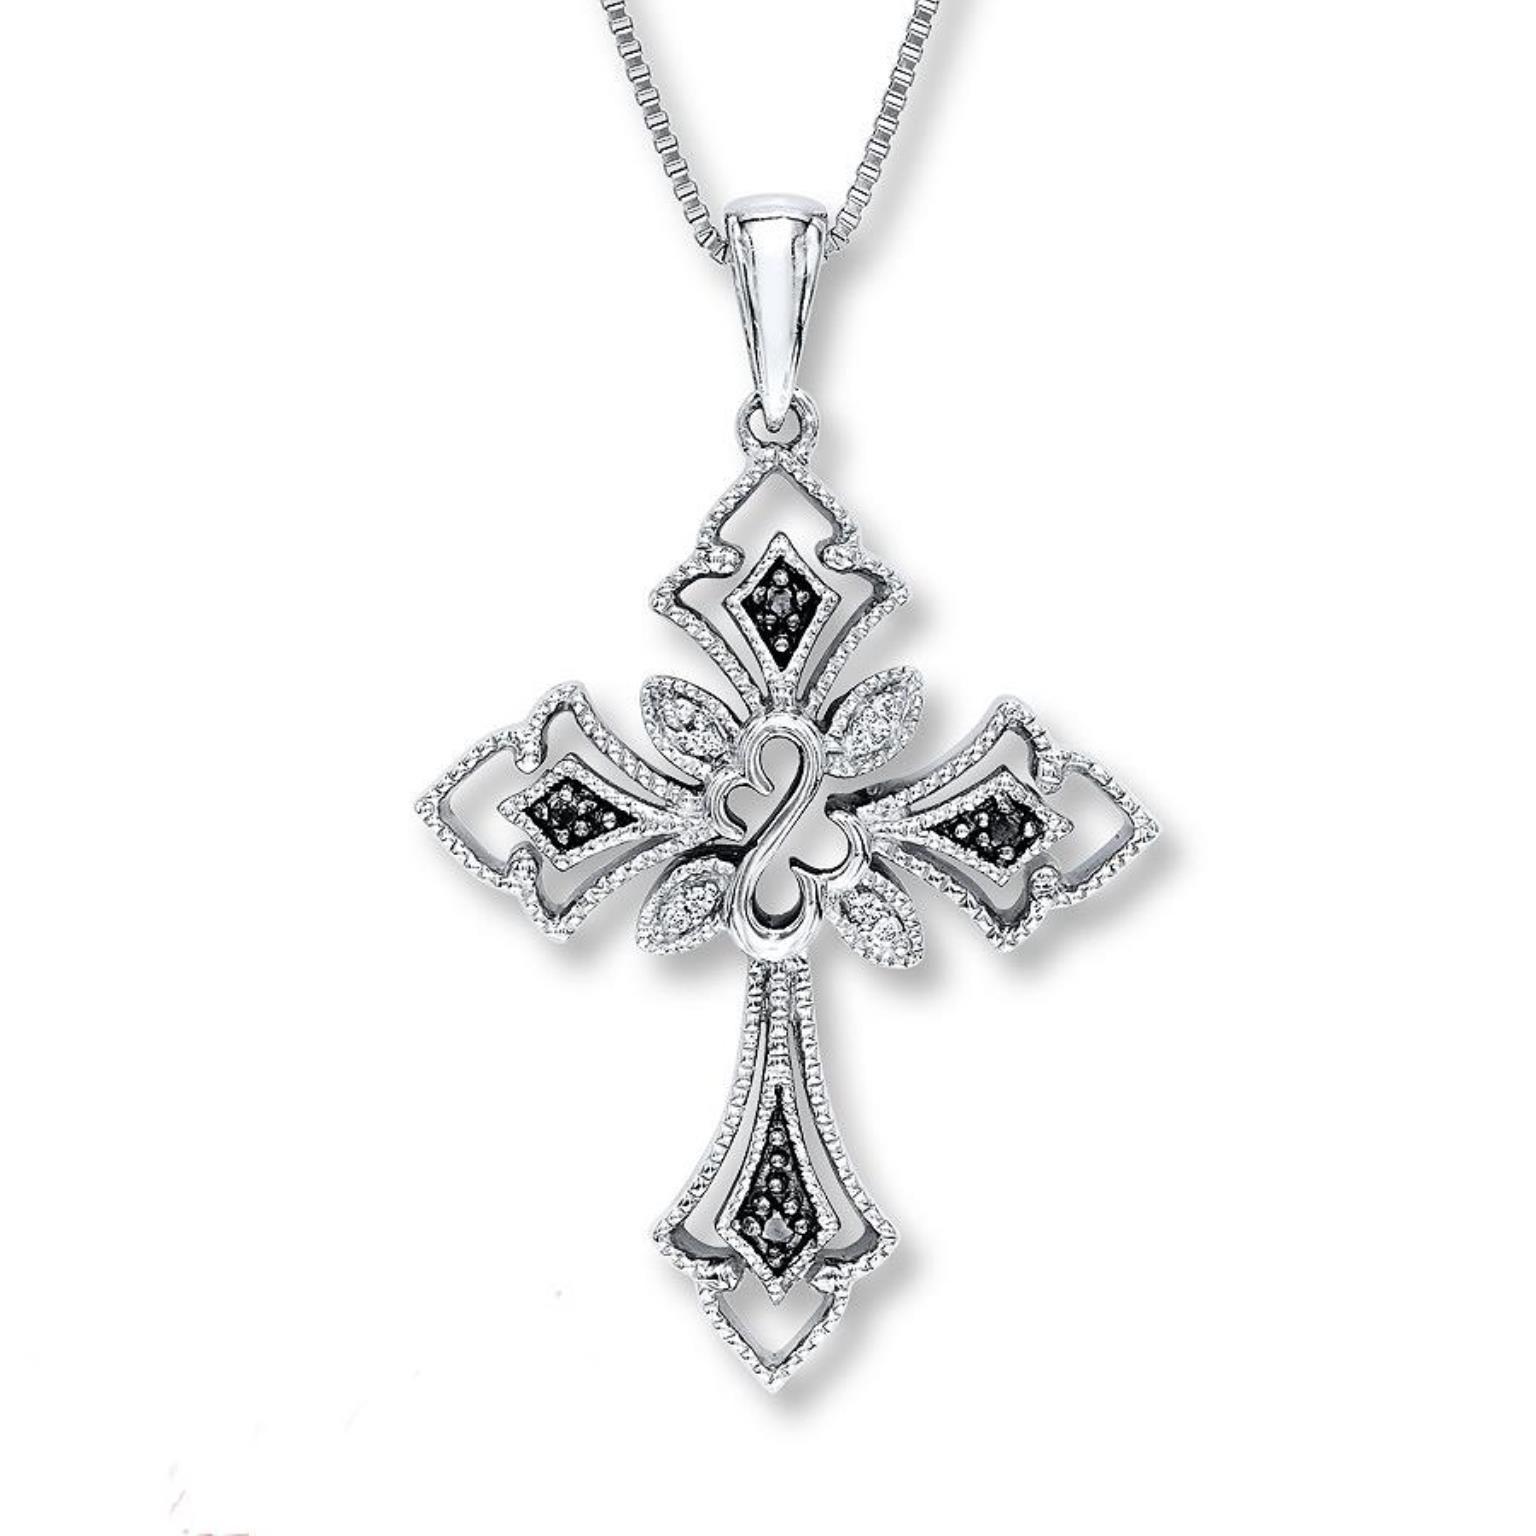 beautiful jane seymour open hearts diamonds necklace. Black Bedroom Furniture Sets. Home Design Ideas